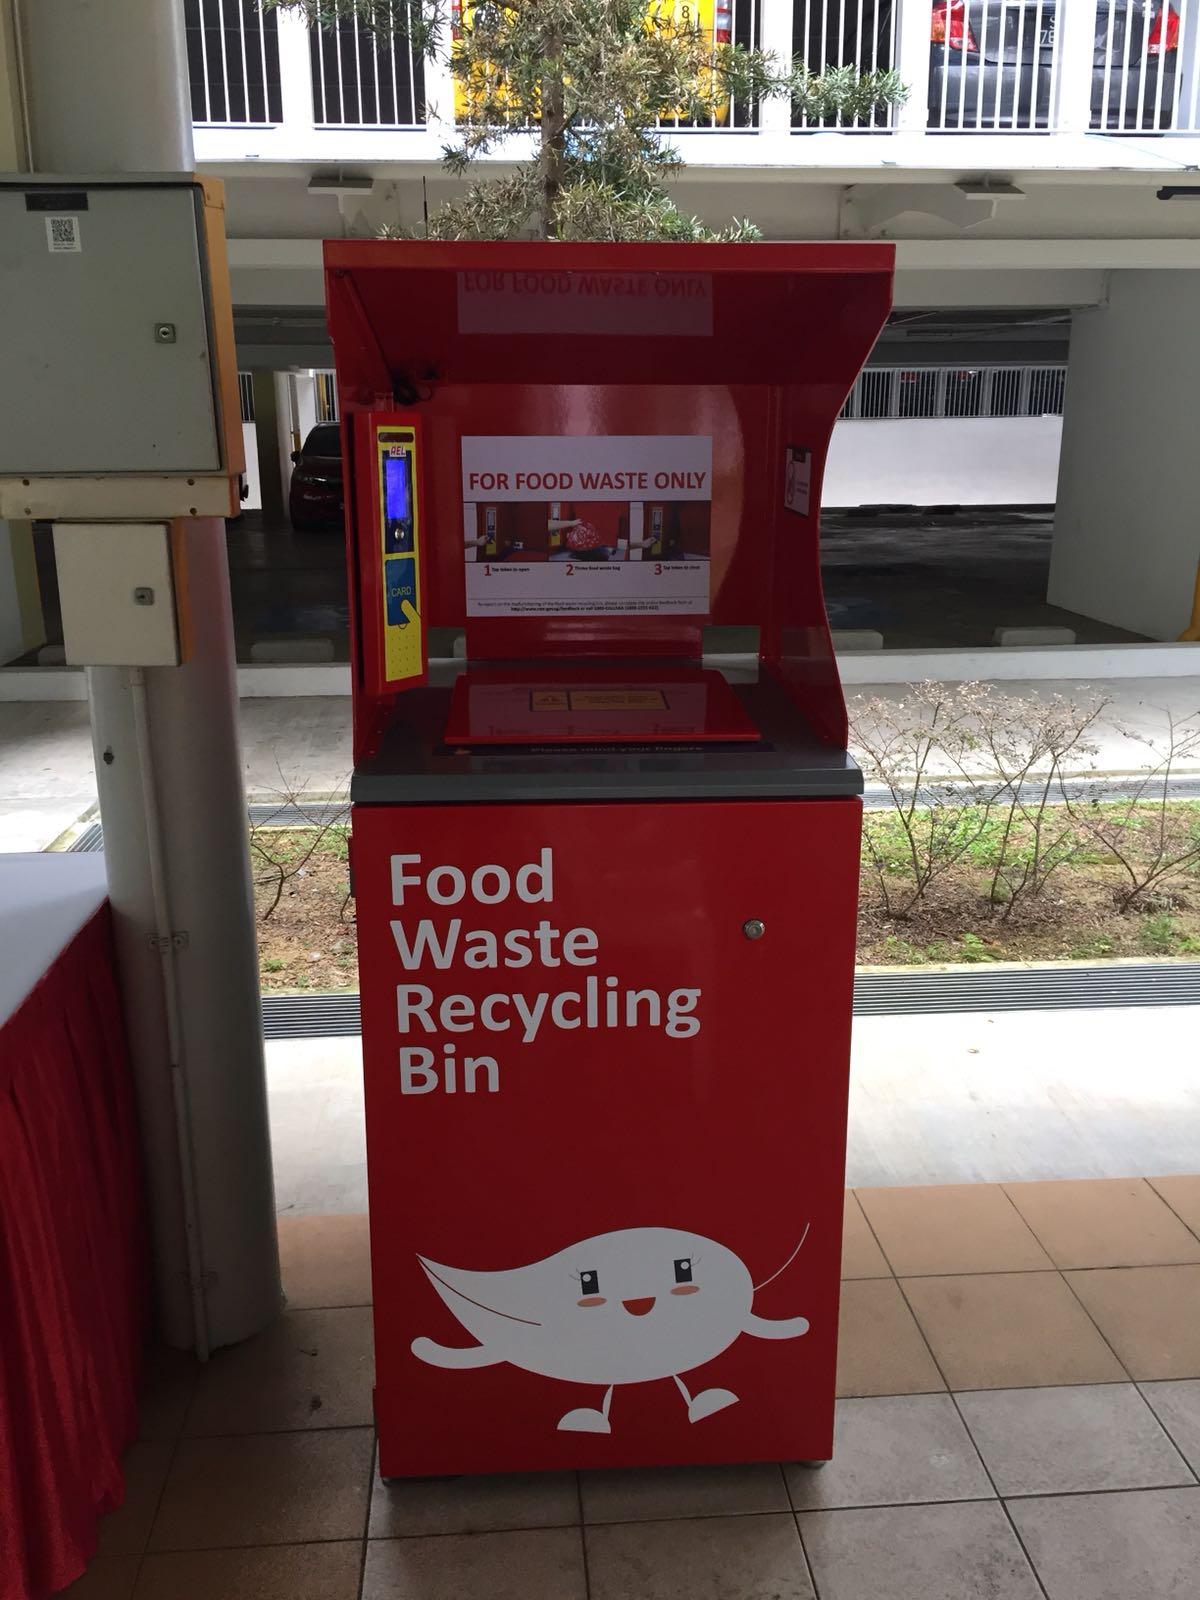 RFID Food Waste Bin